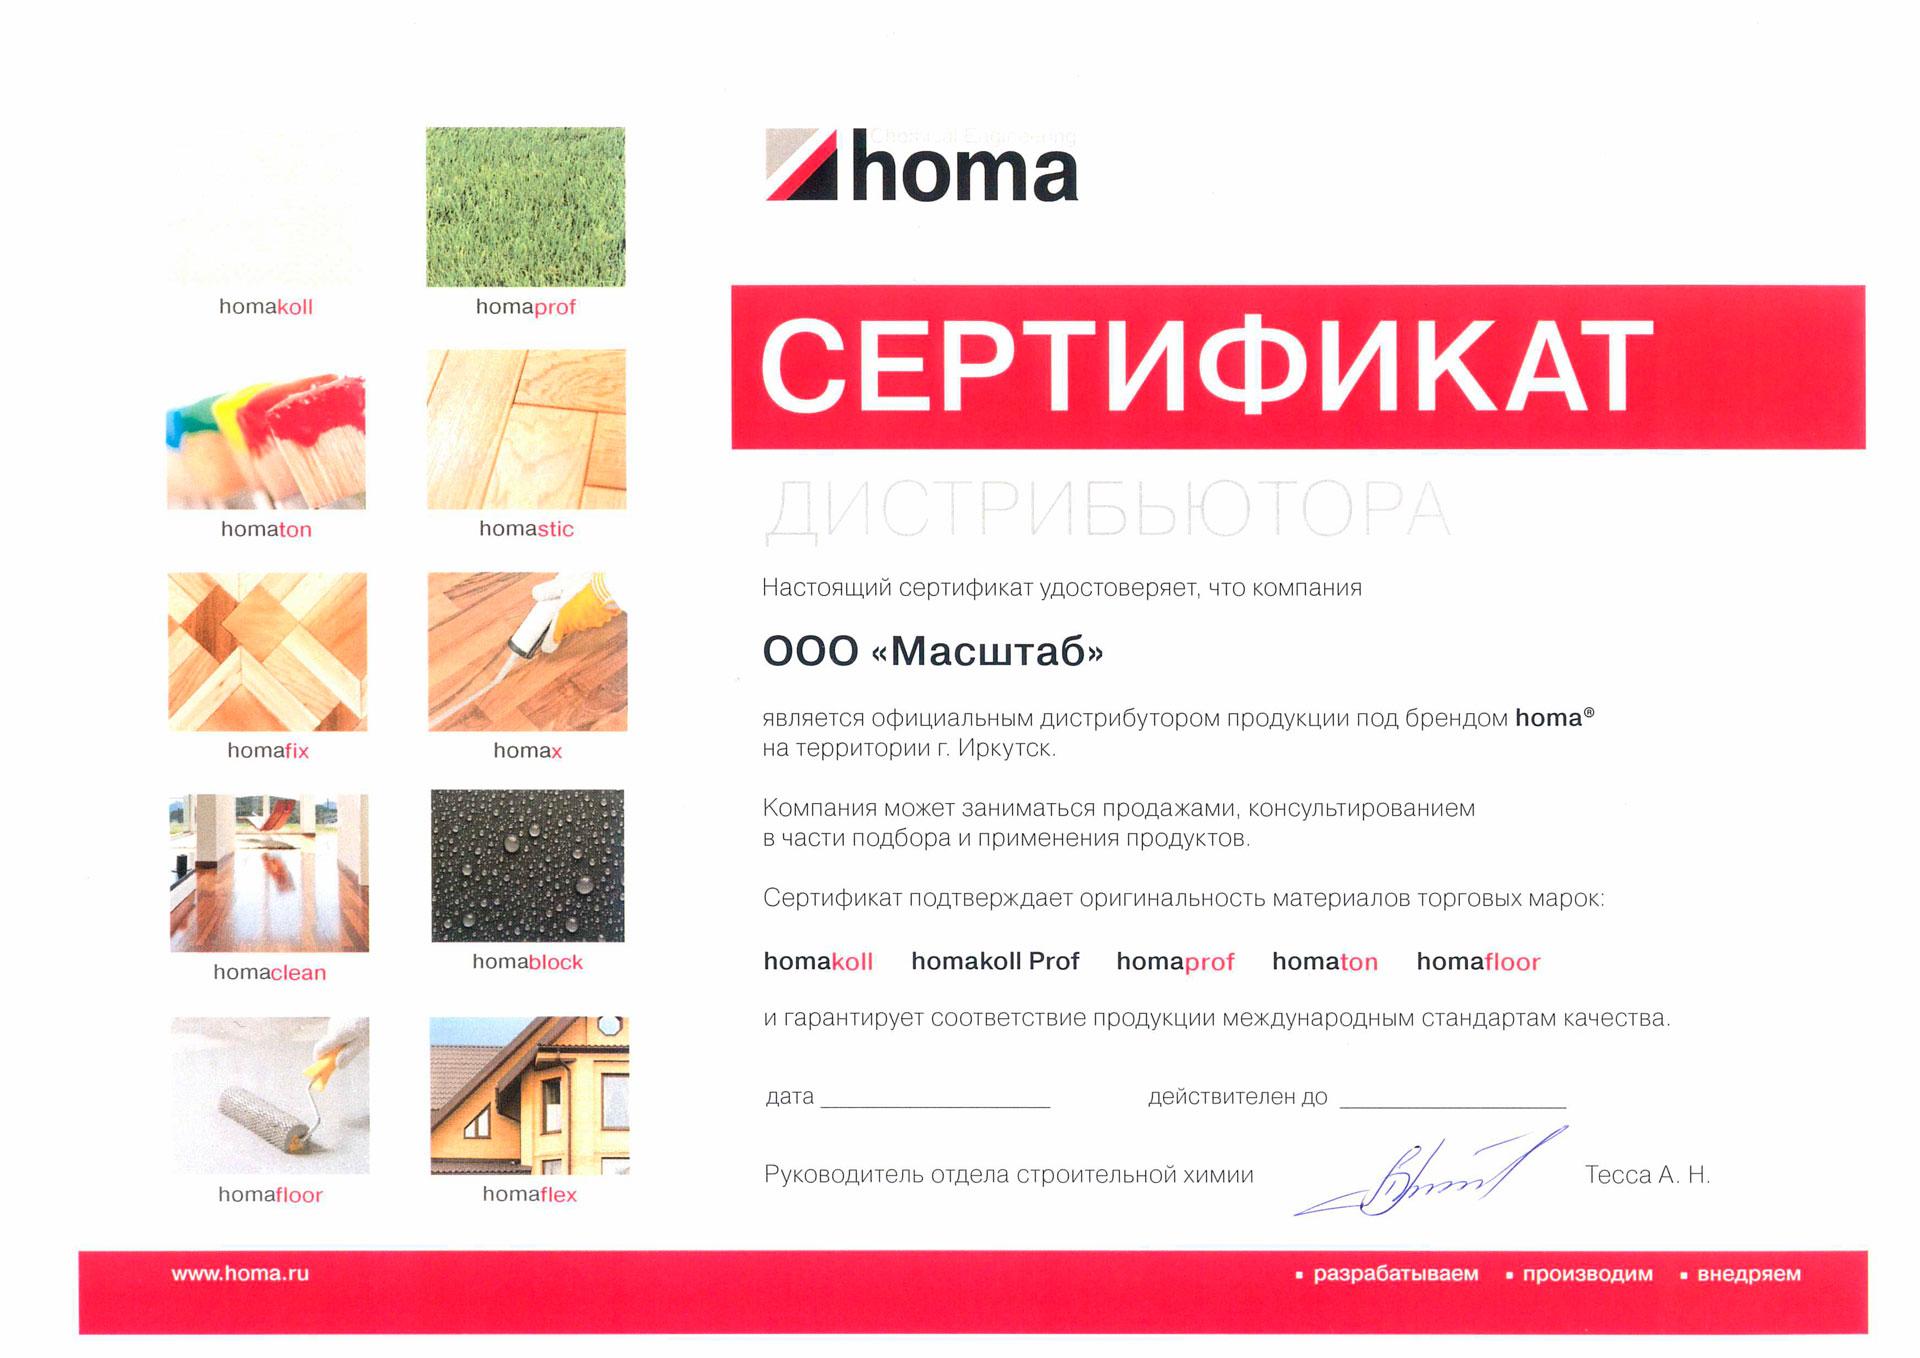 homakoll-distr